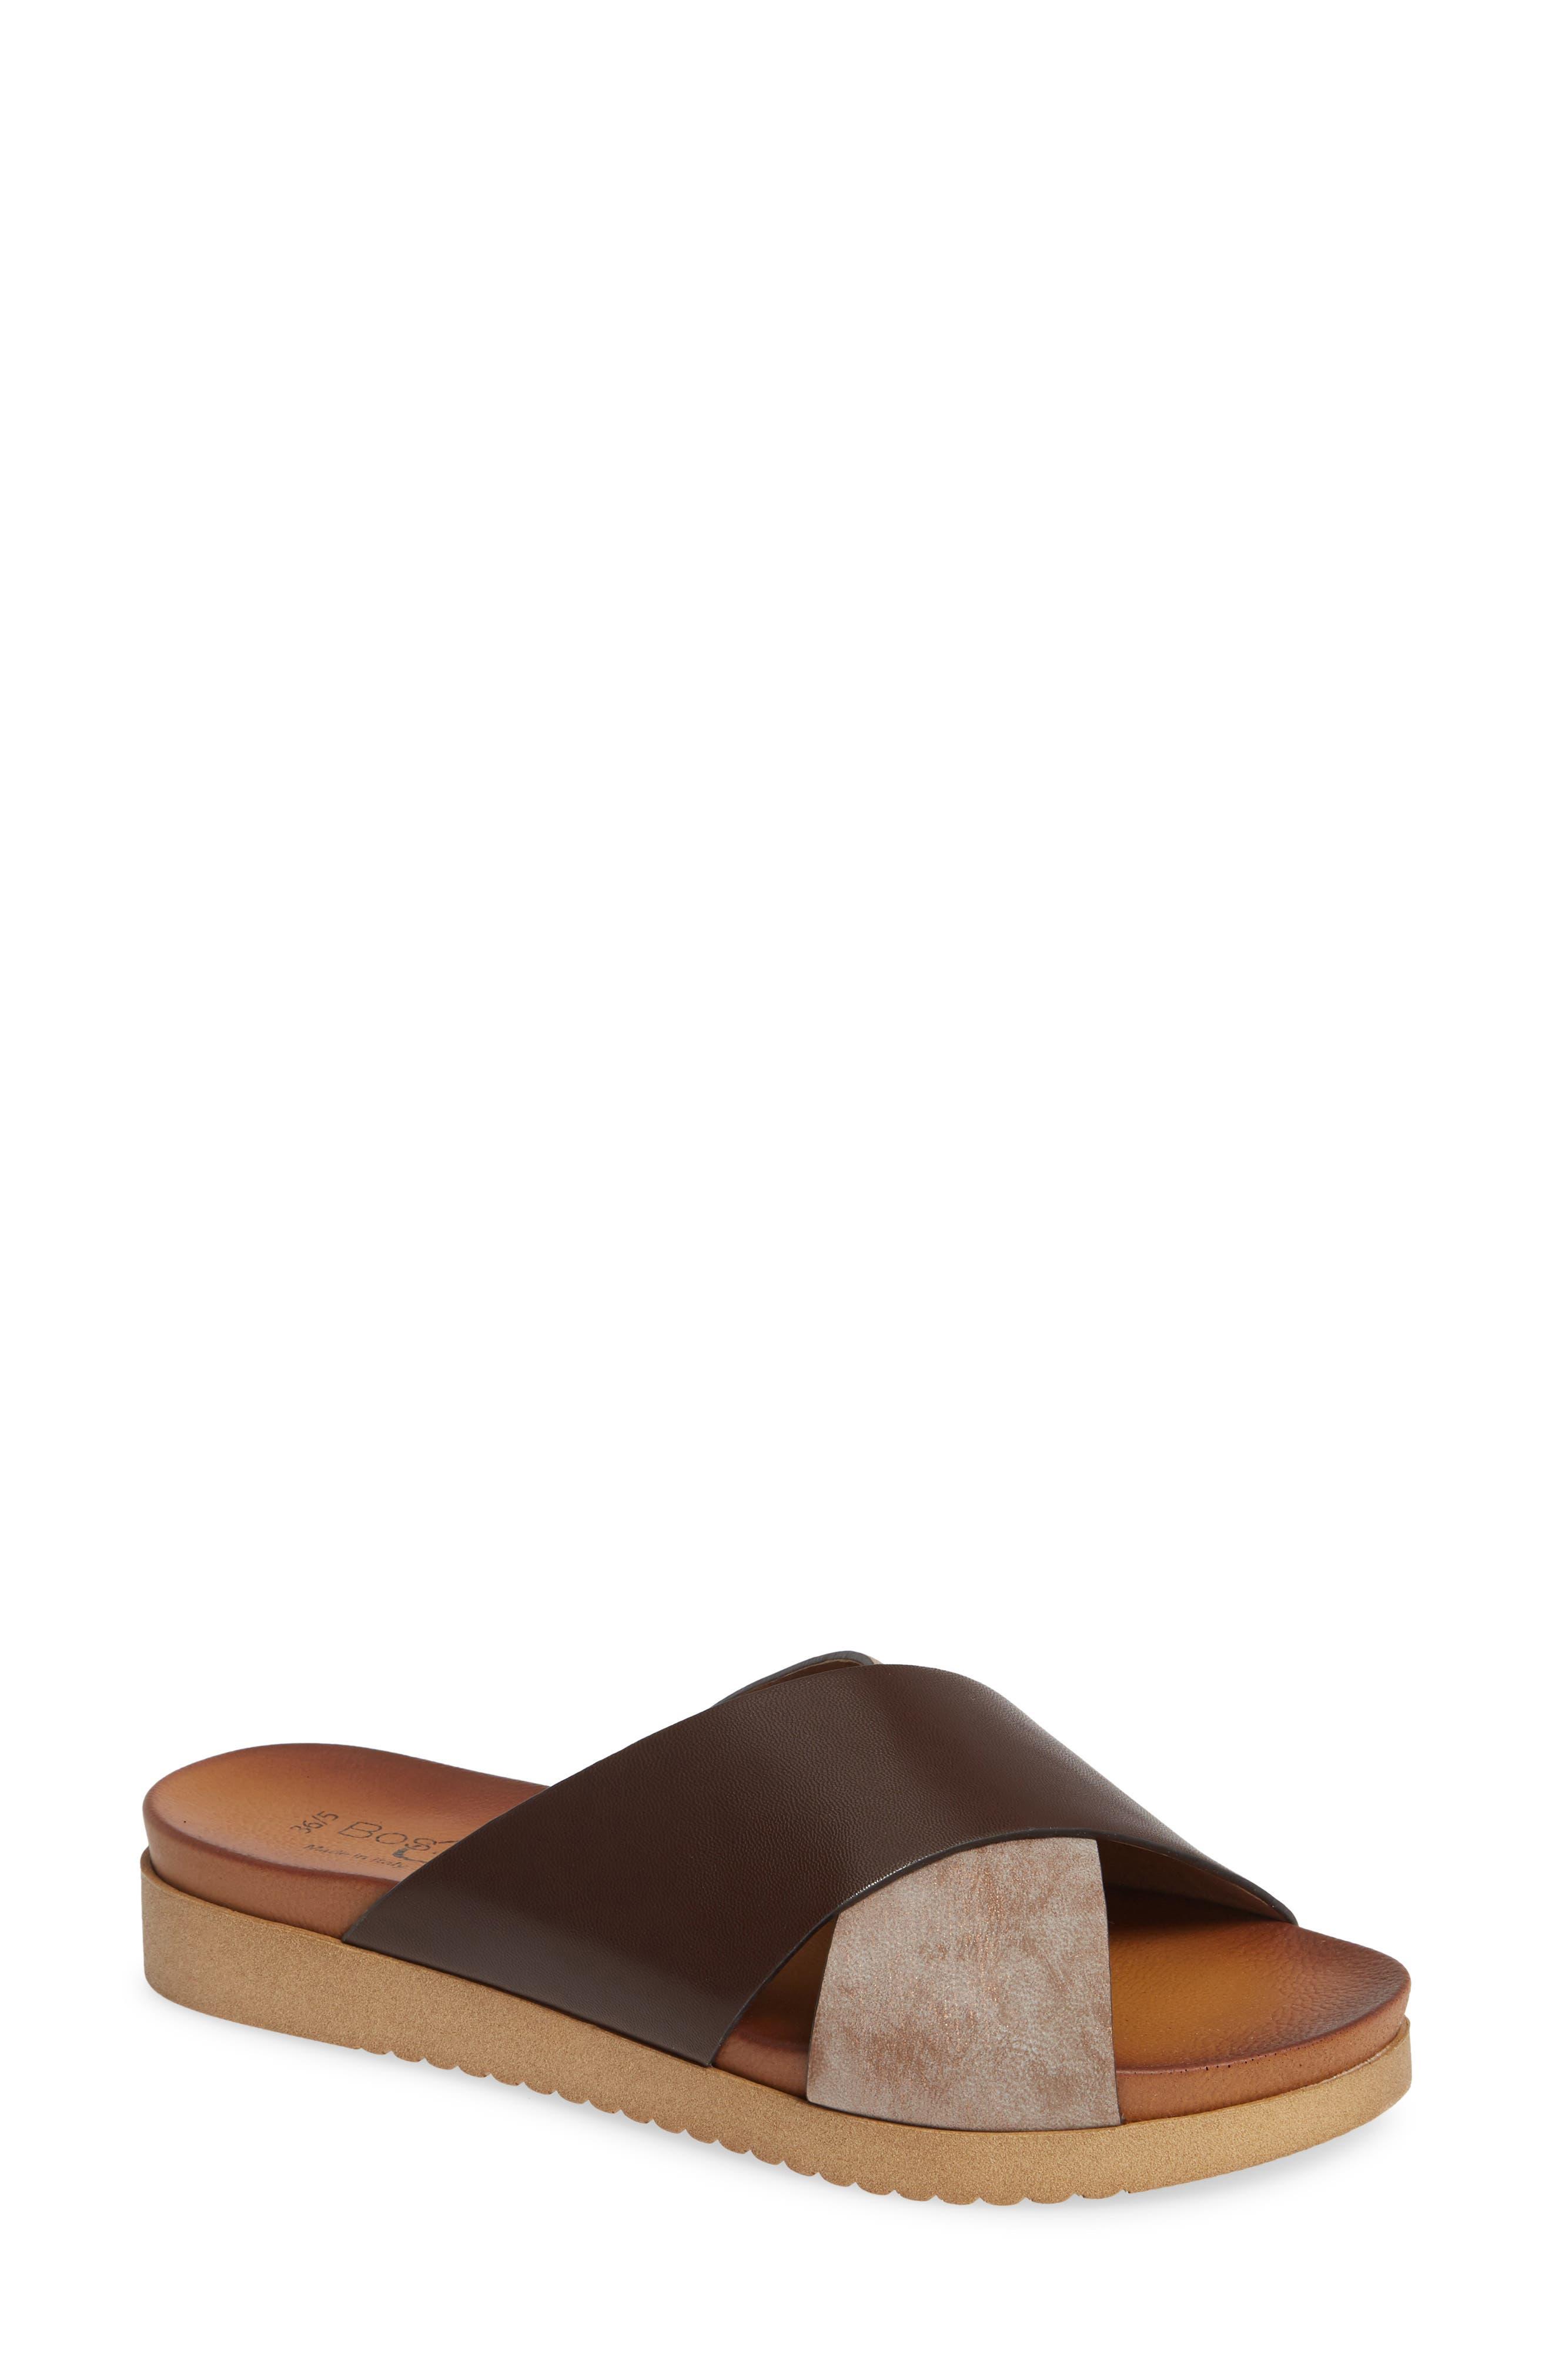 Rwon Slide Sandal